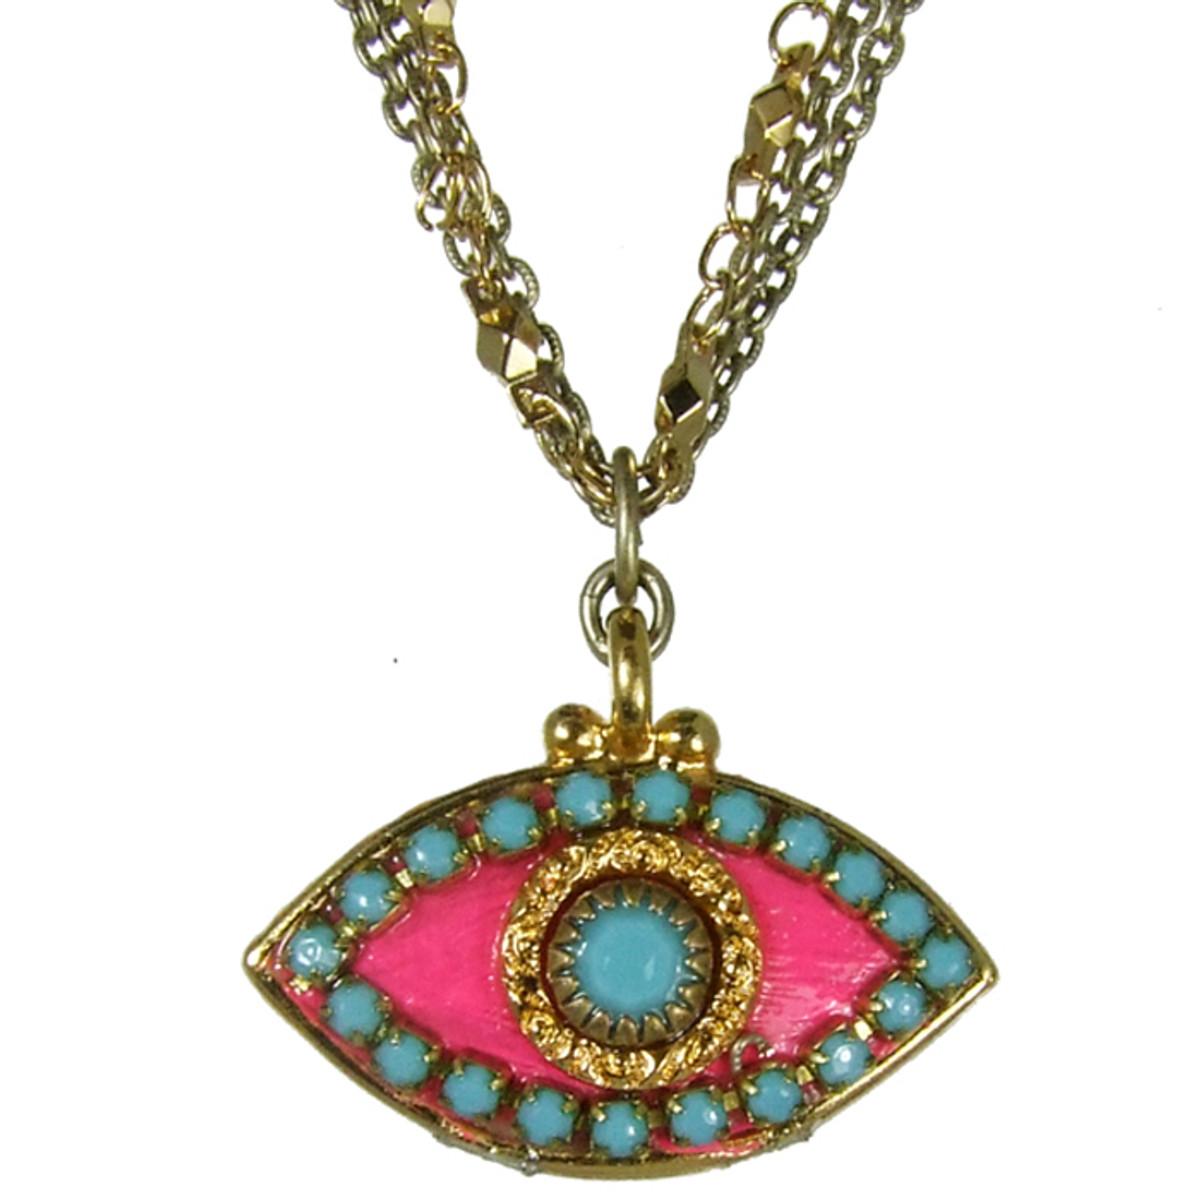 Evil Eye Necklace - Pink, Medium Eye With Blue Edges & Center